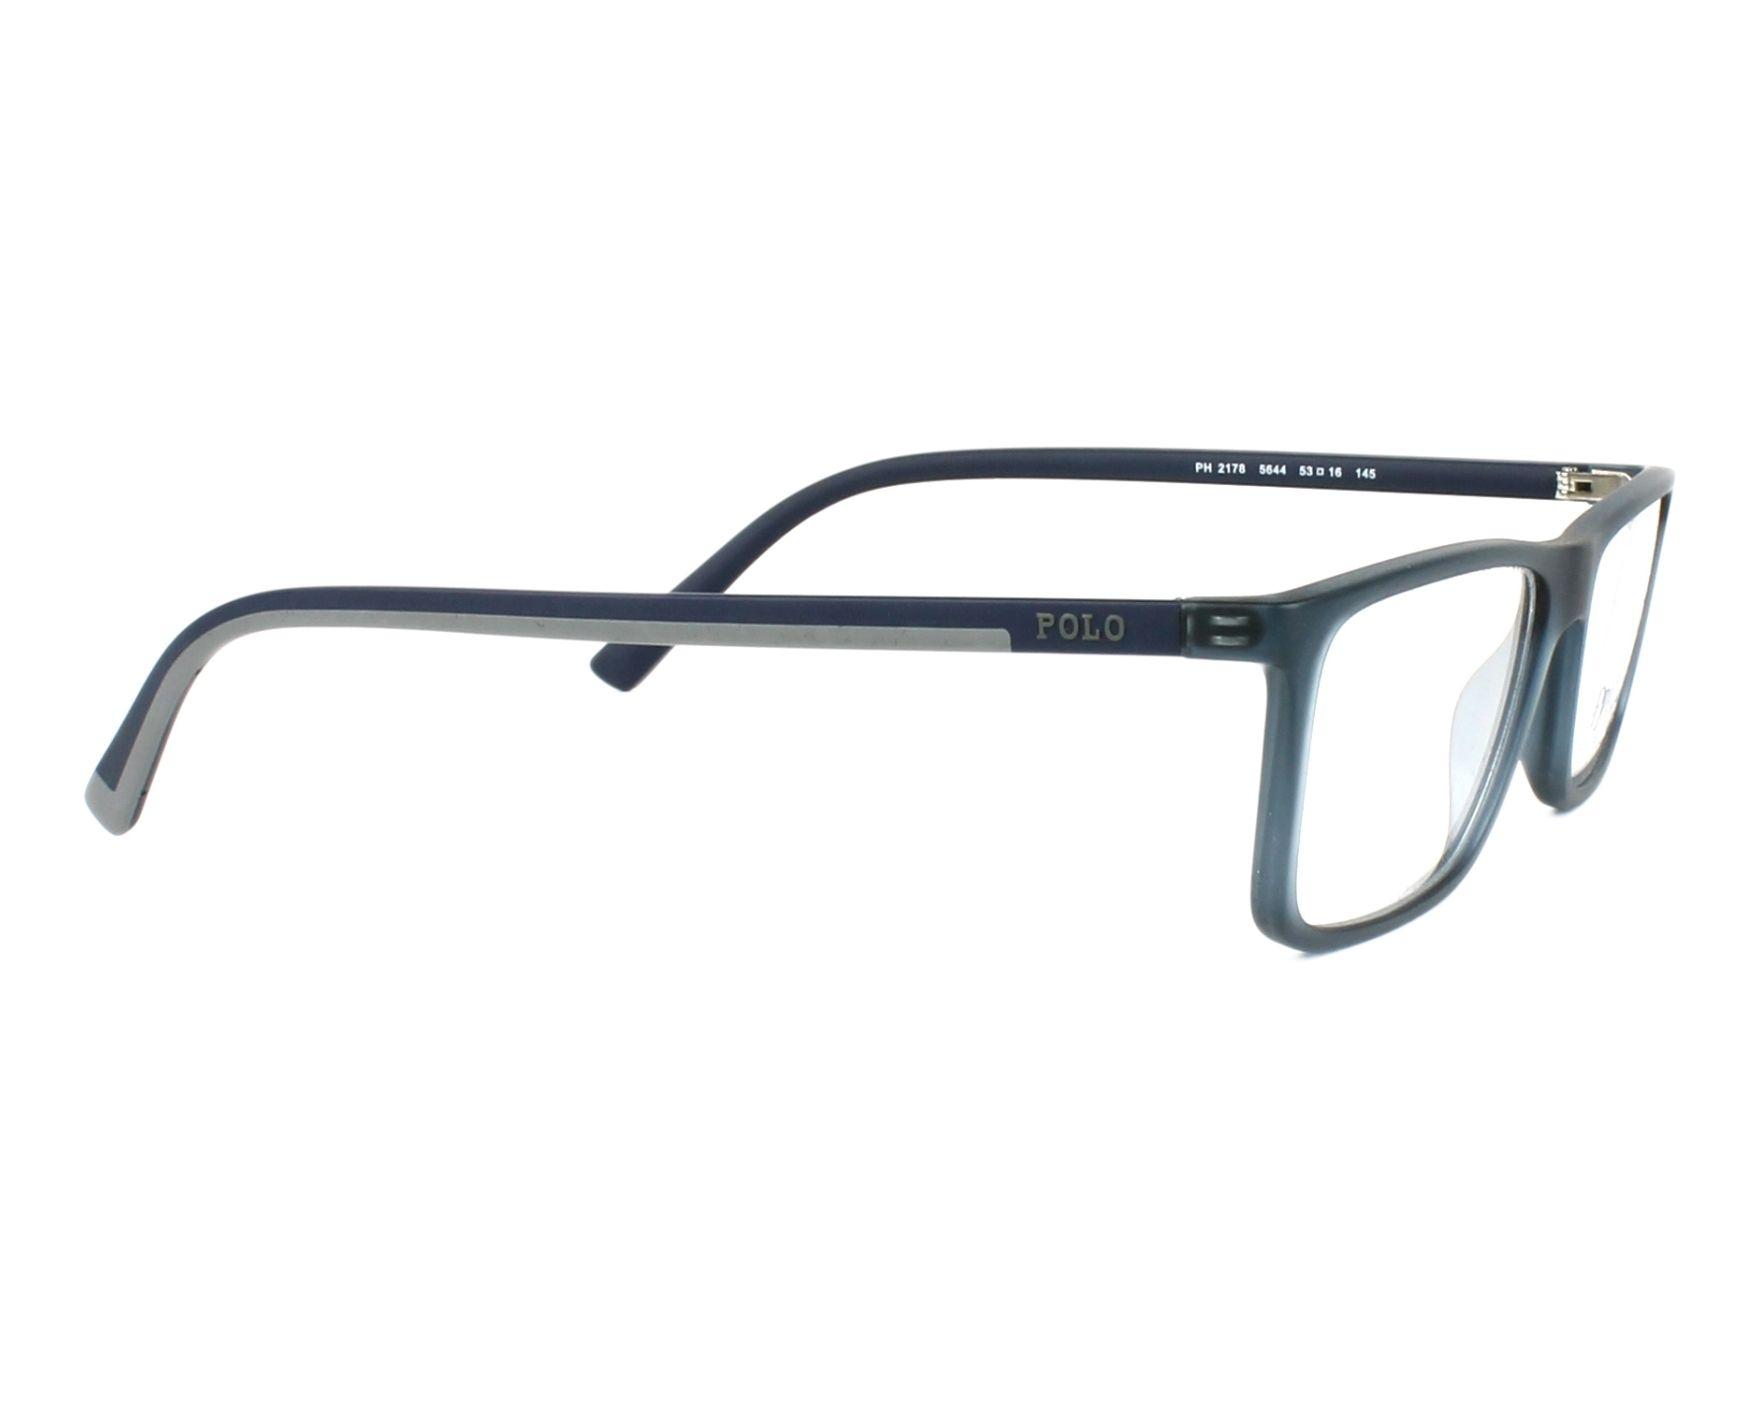 71b3205a5d7 eyeglasses Polo Ralph Lauren PH-2178 5644 - Grey Blue side view